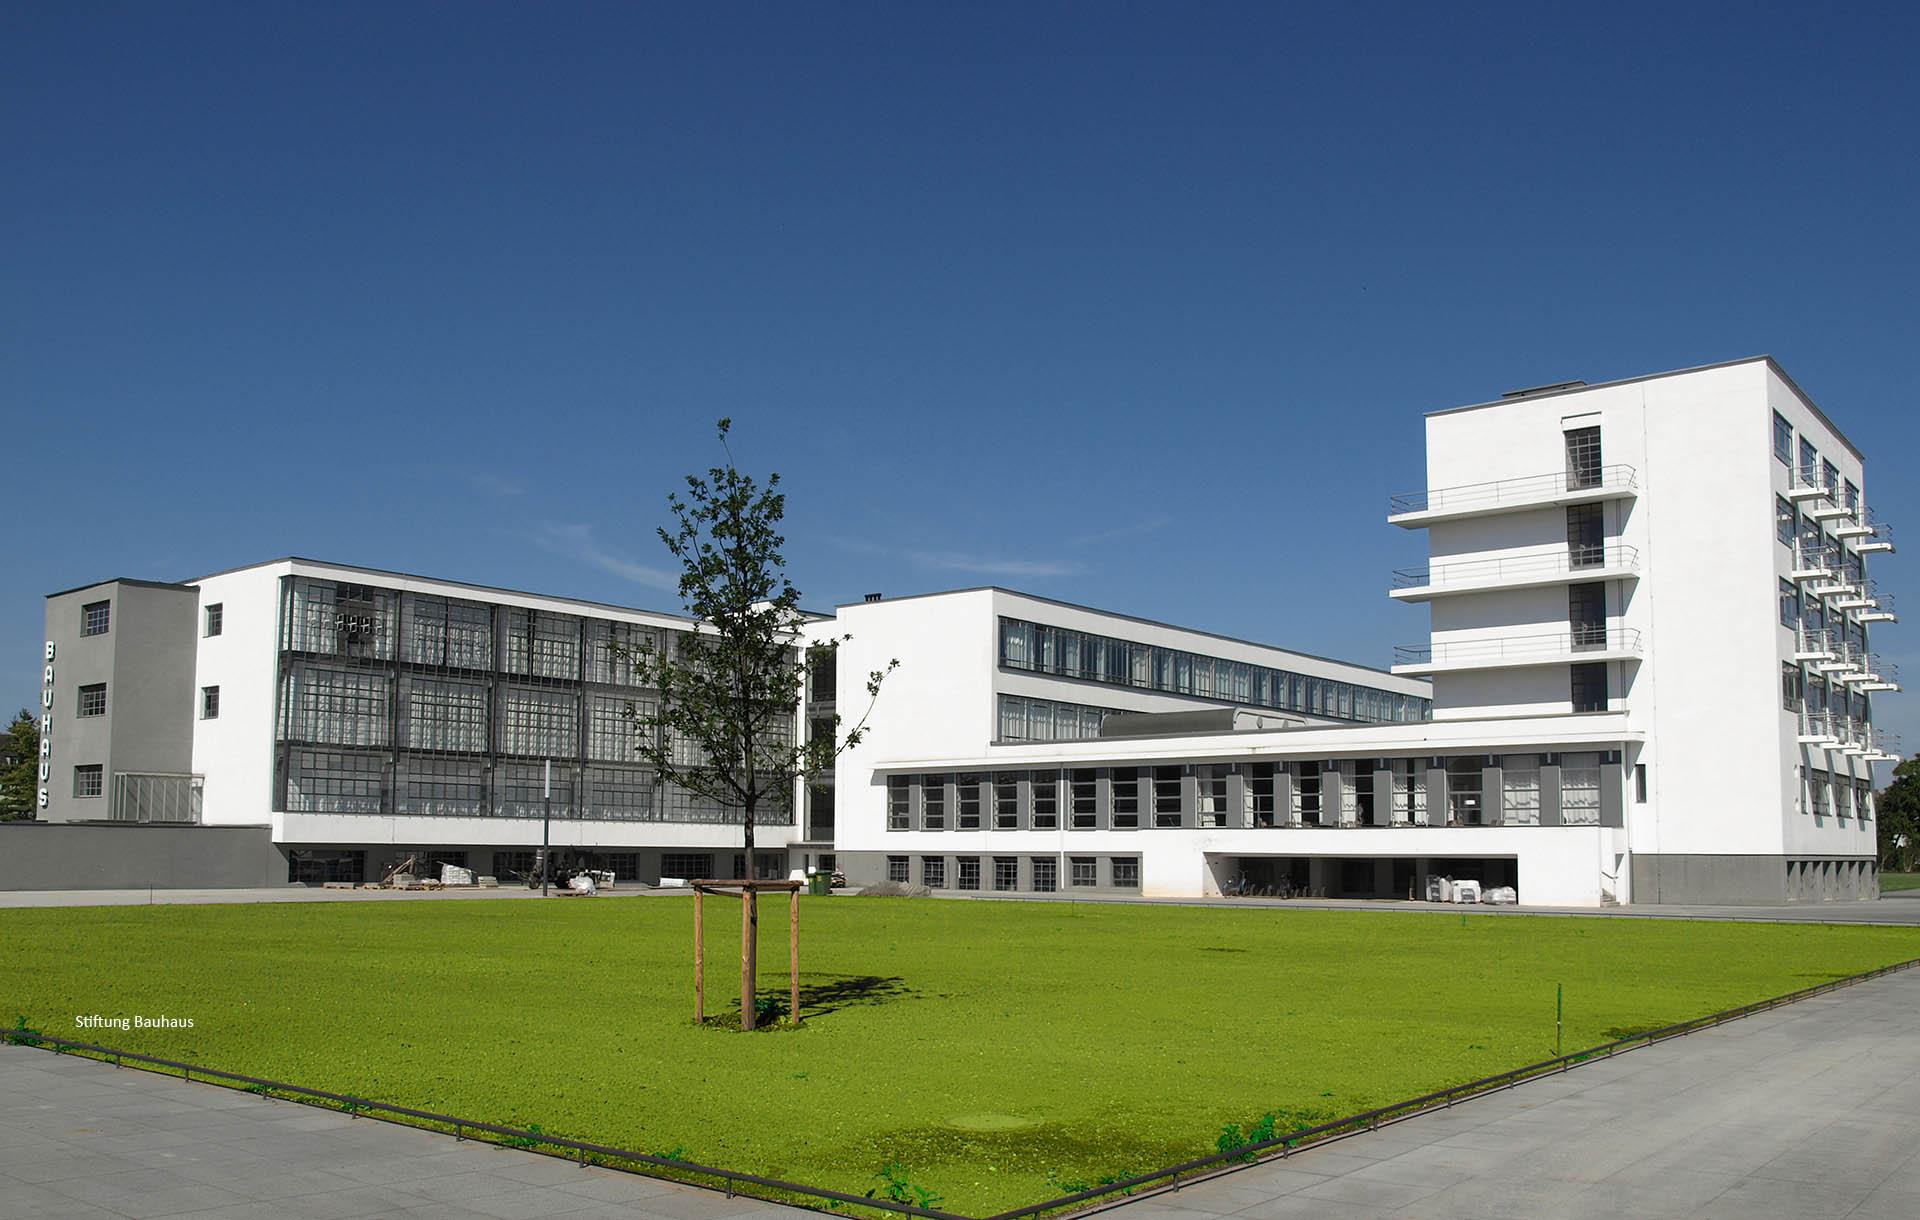 Bauhaus Dessau renovatie met MHB classic-iso2